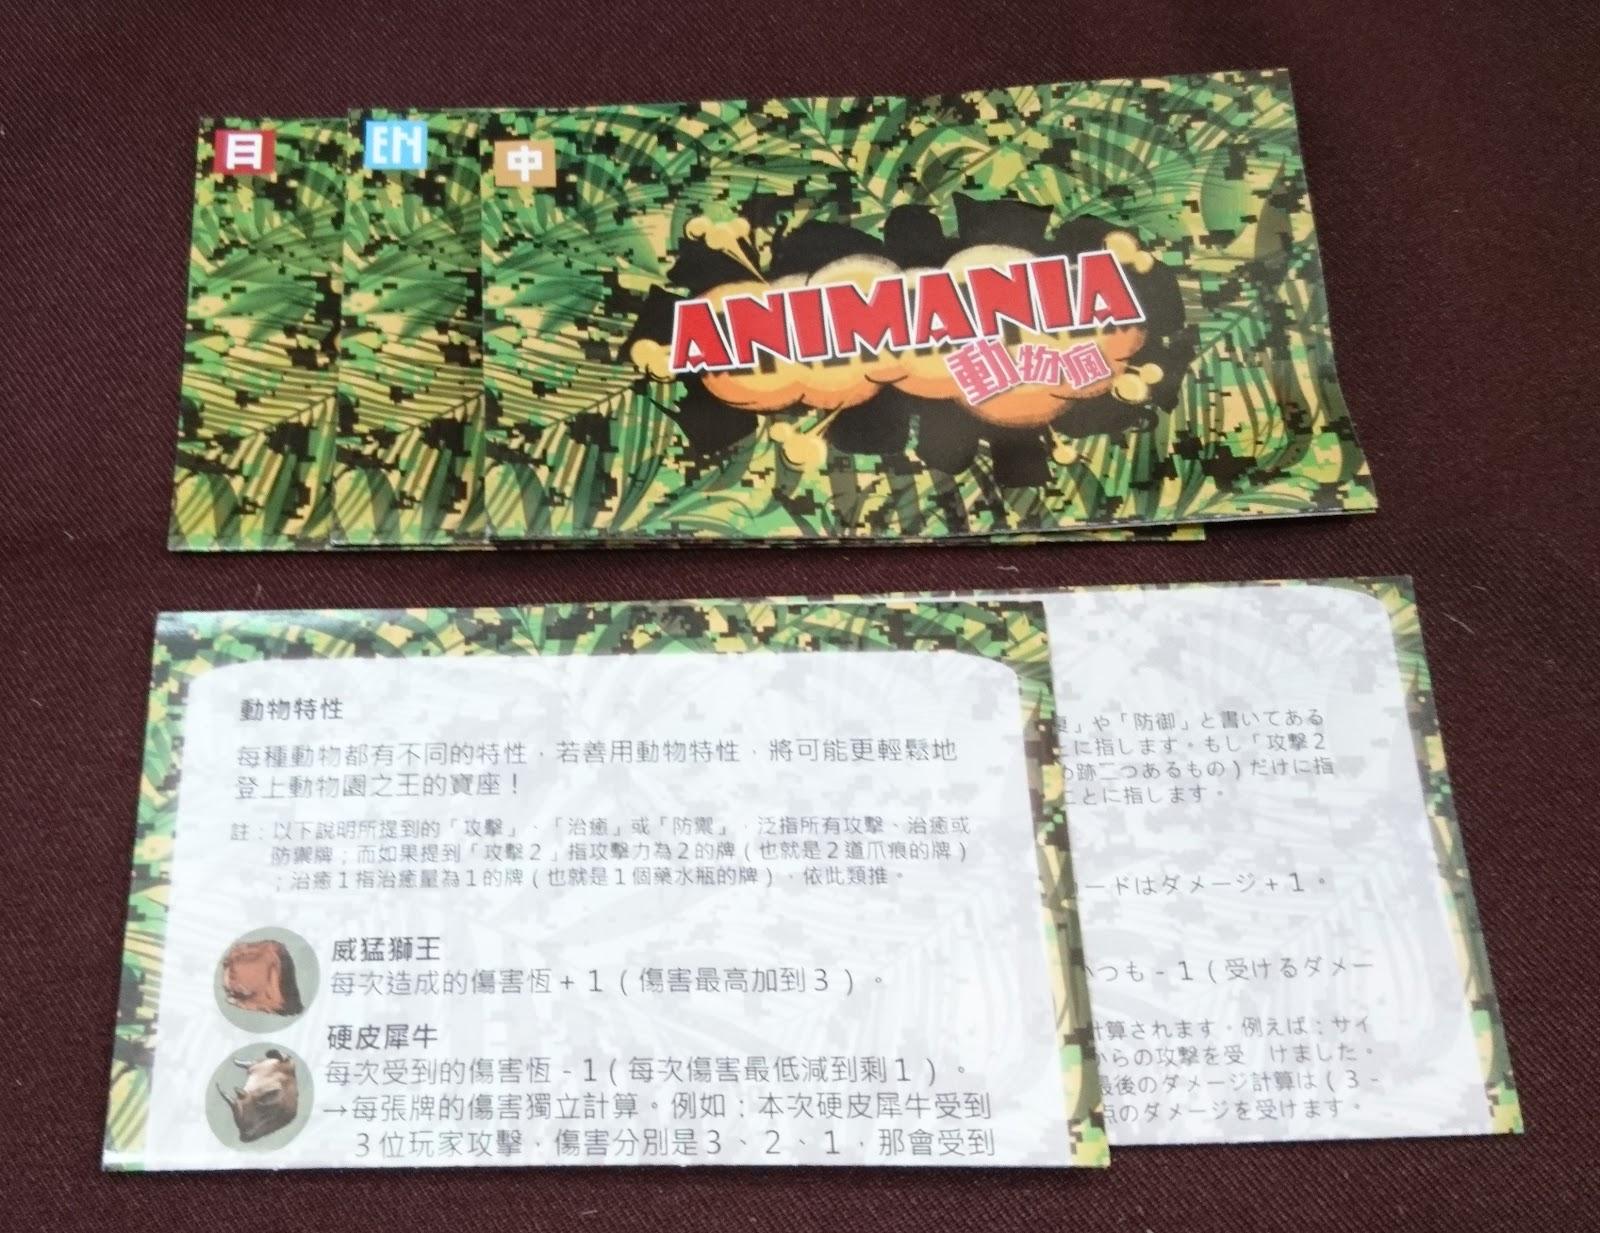 Animania_07.JPG